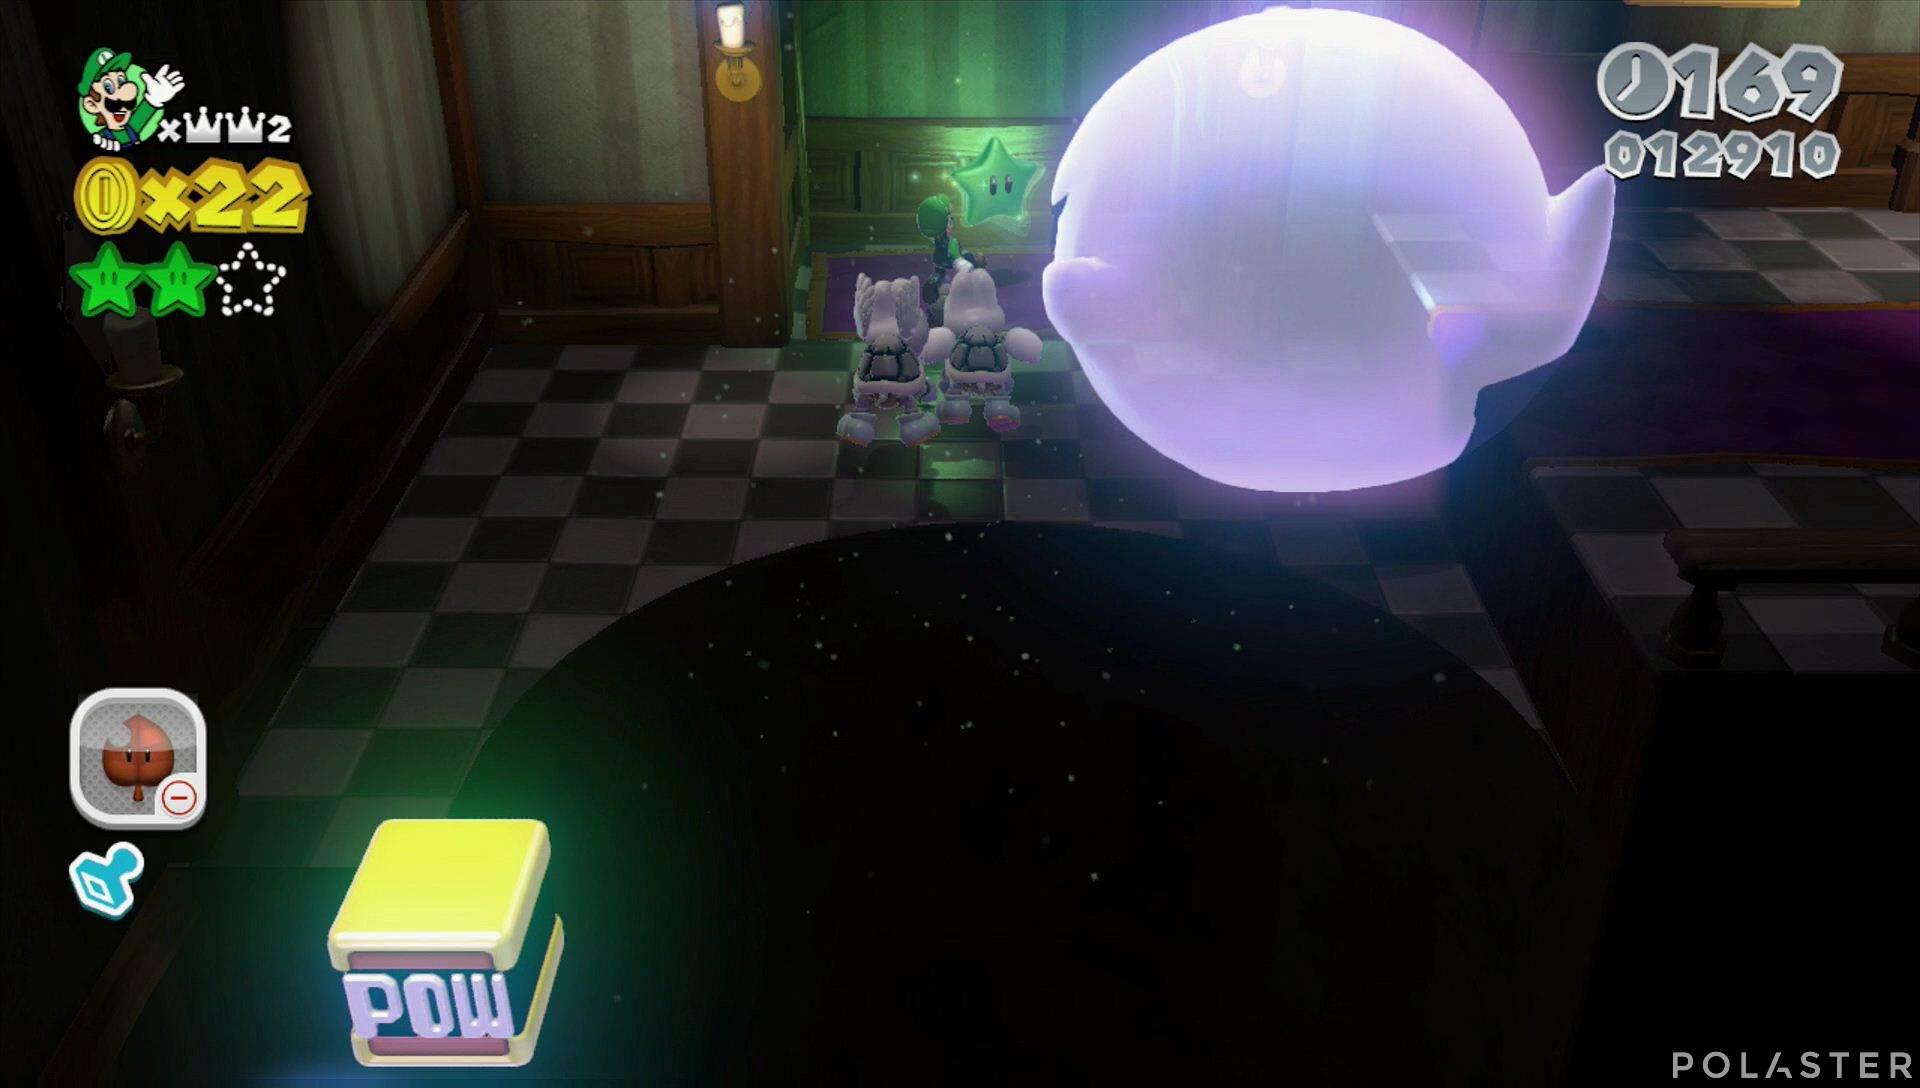 Super Mario 3D World Mundo Bowser-6 Estrella 3